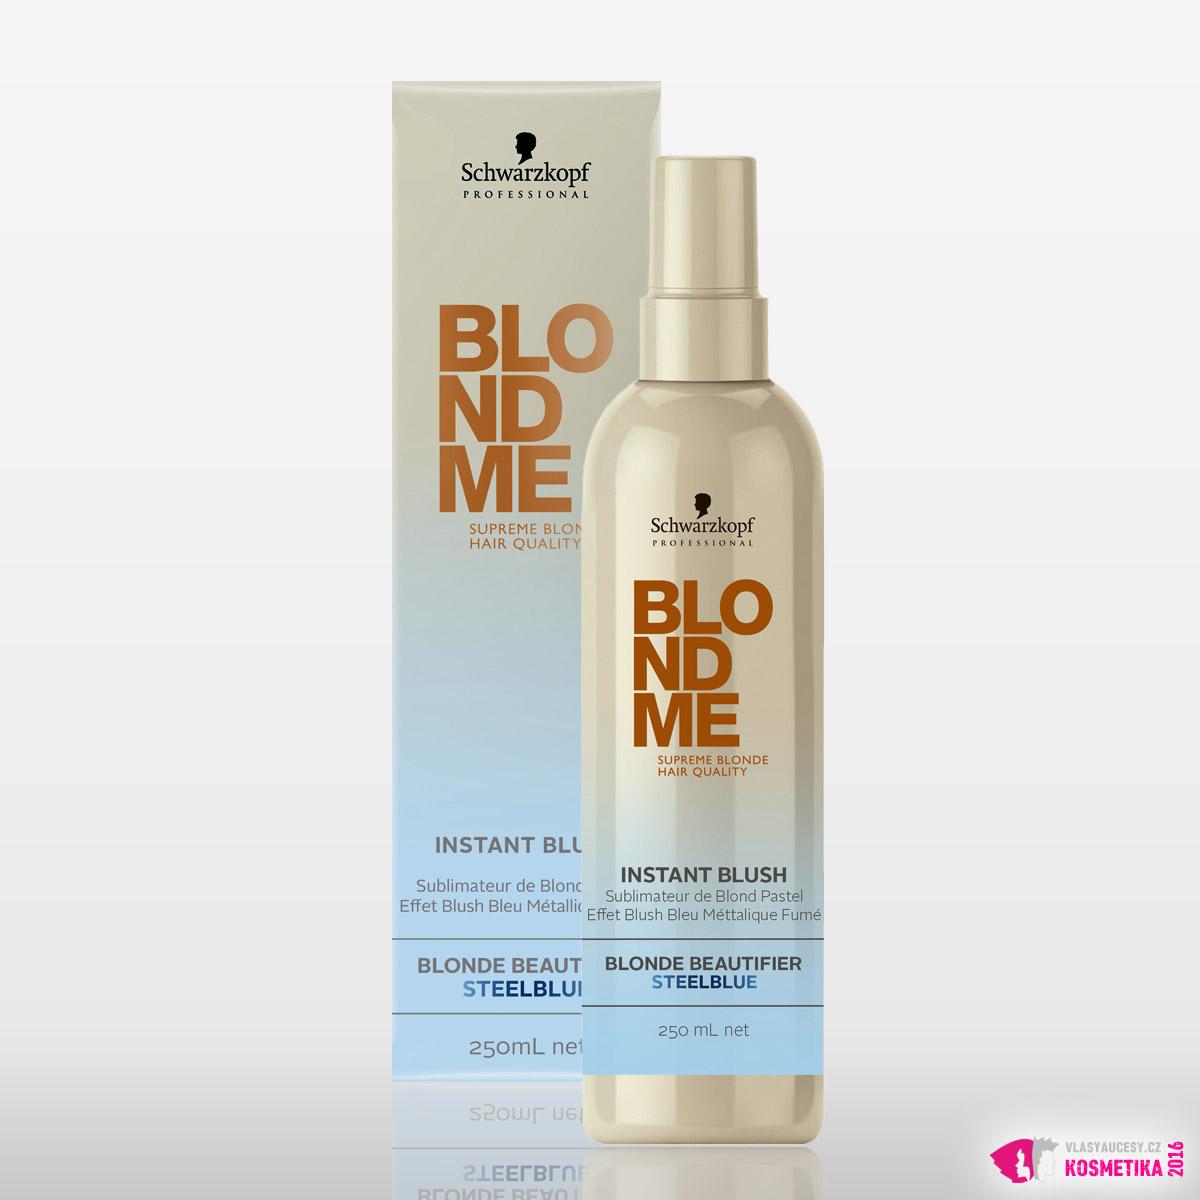 BlondMe Instant Blush - Blonde Beautifier Steelblue od Schwarzkopf Professional